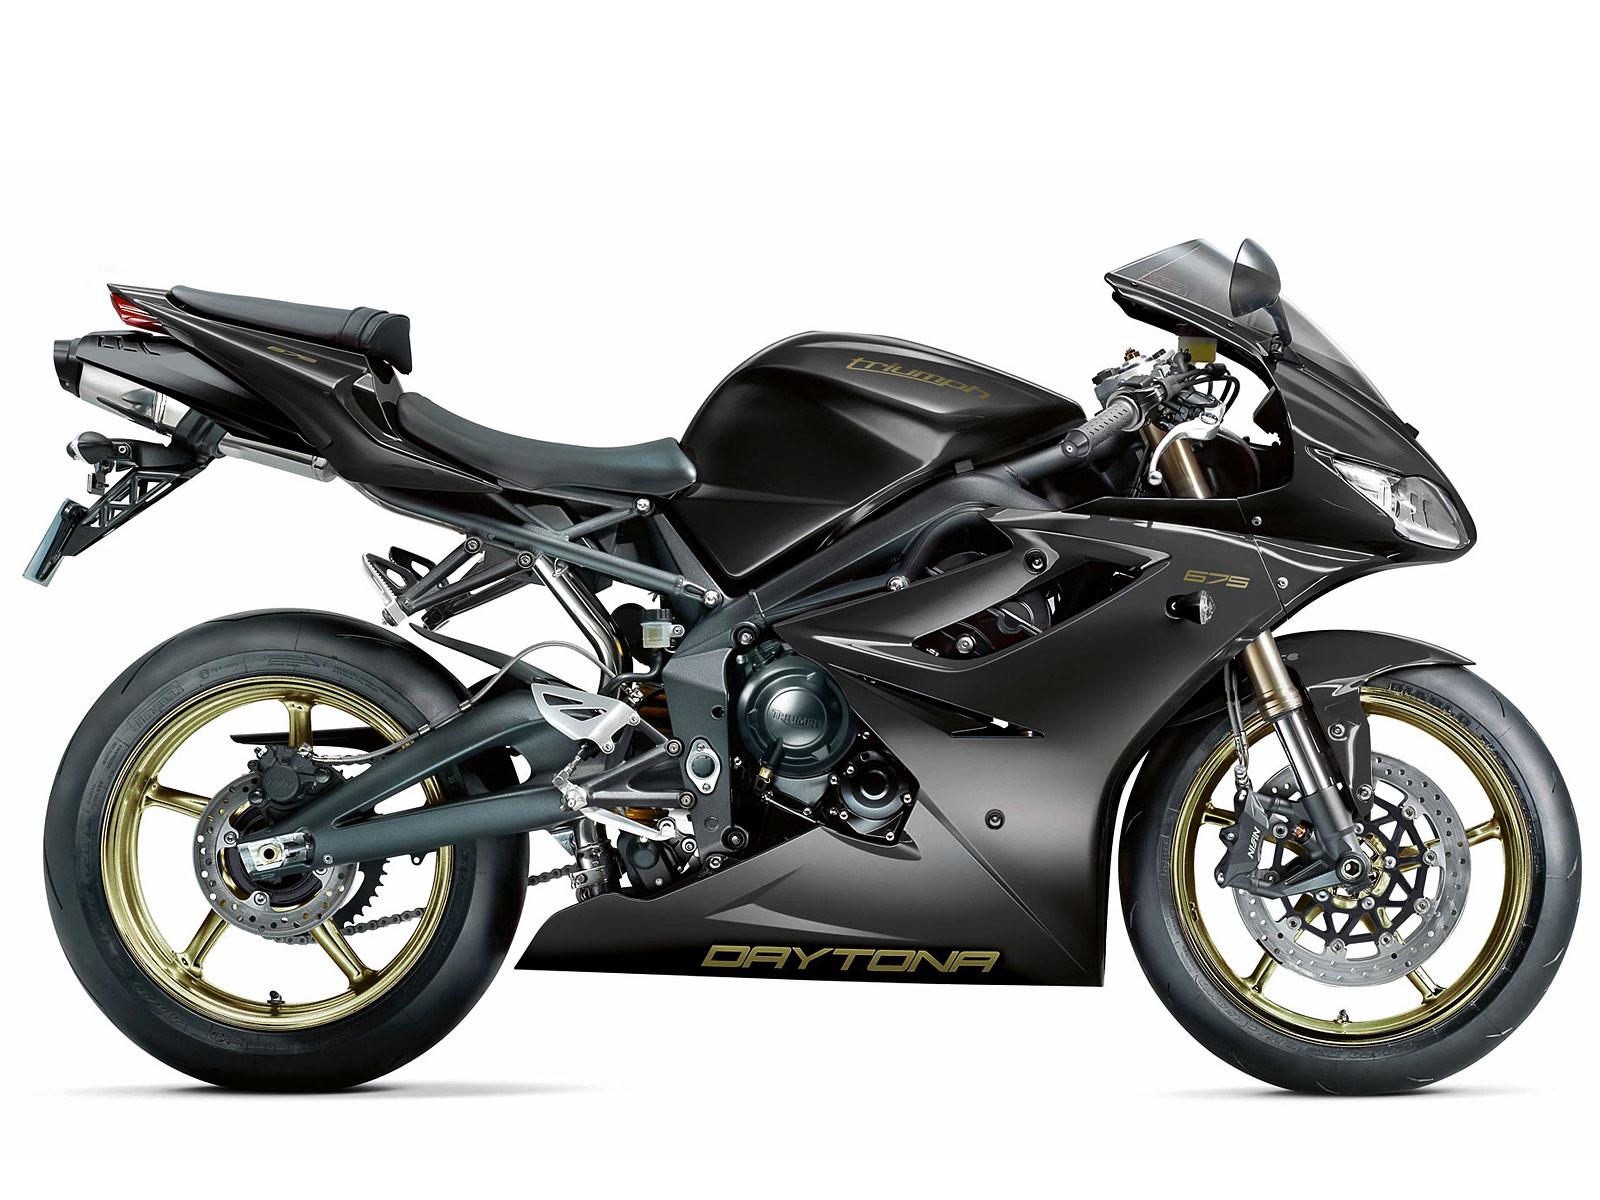 2012 Triumph Daytona 675 Motorcycle Pictures